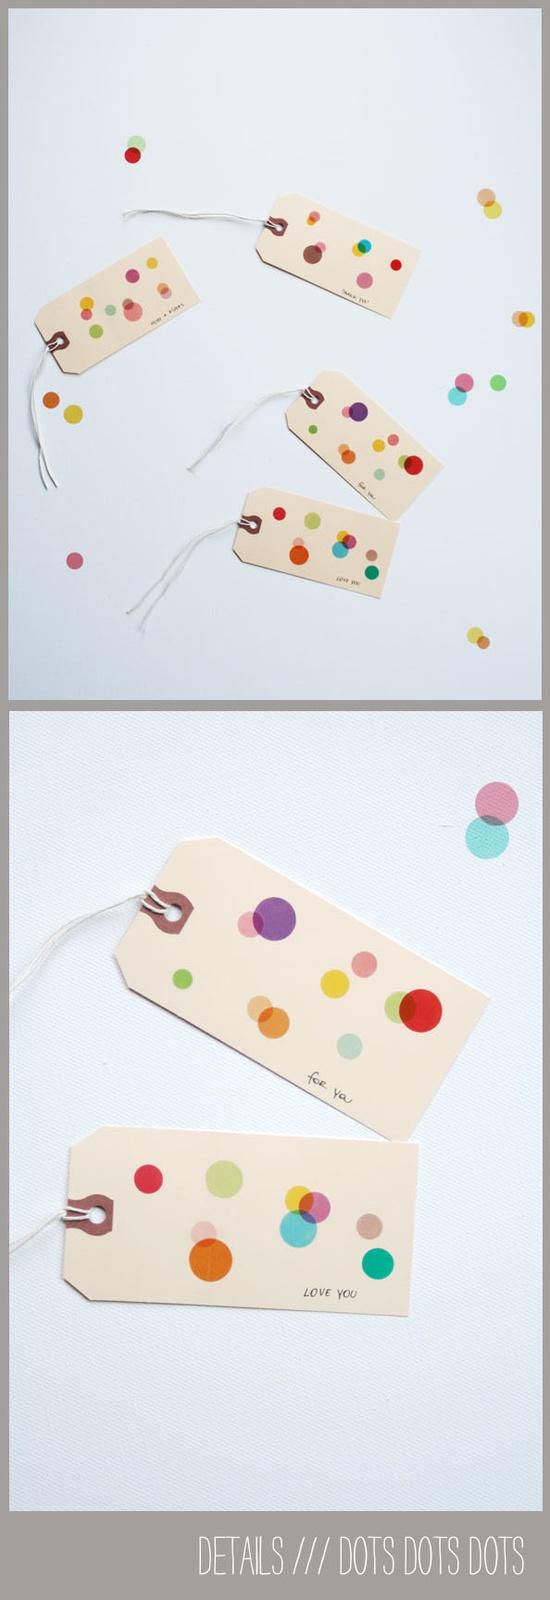 sticker dot gift tags from Tokketok